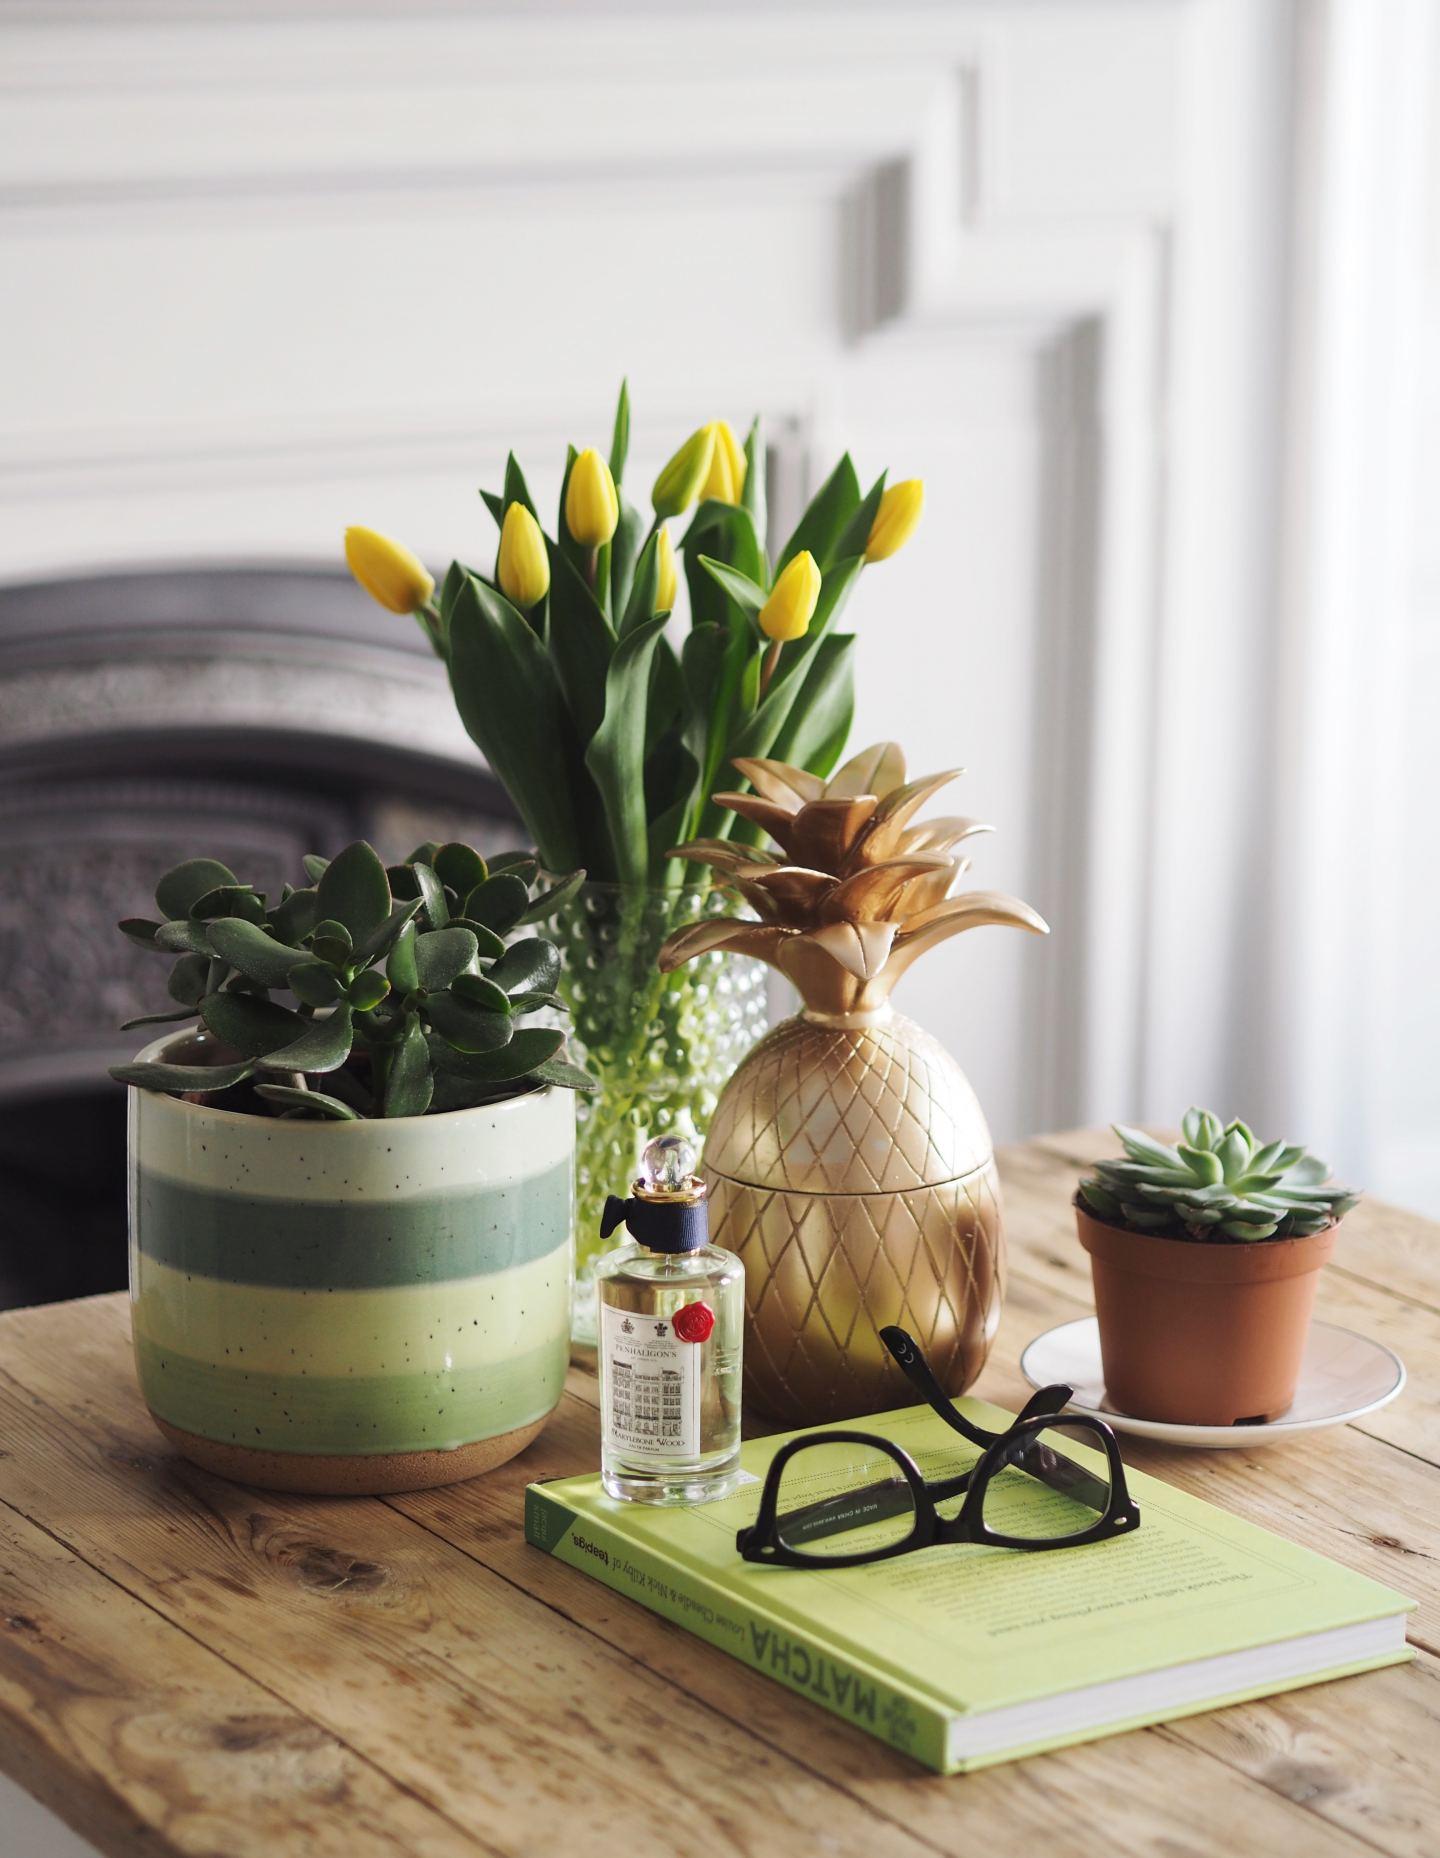 Penhaligon's 'Marylebone Wood' perfume fragrance